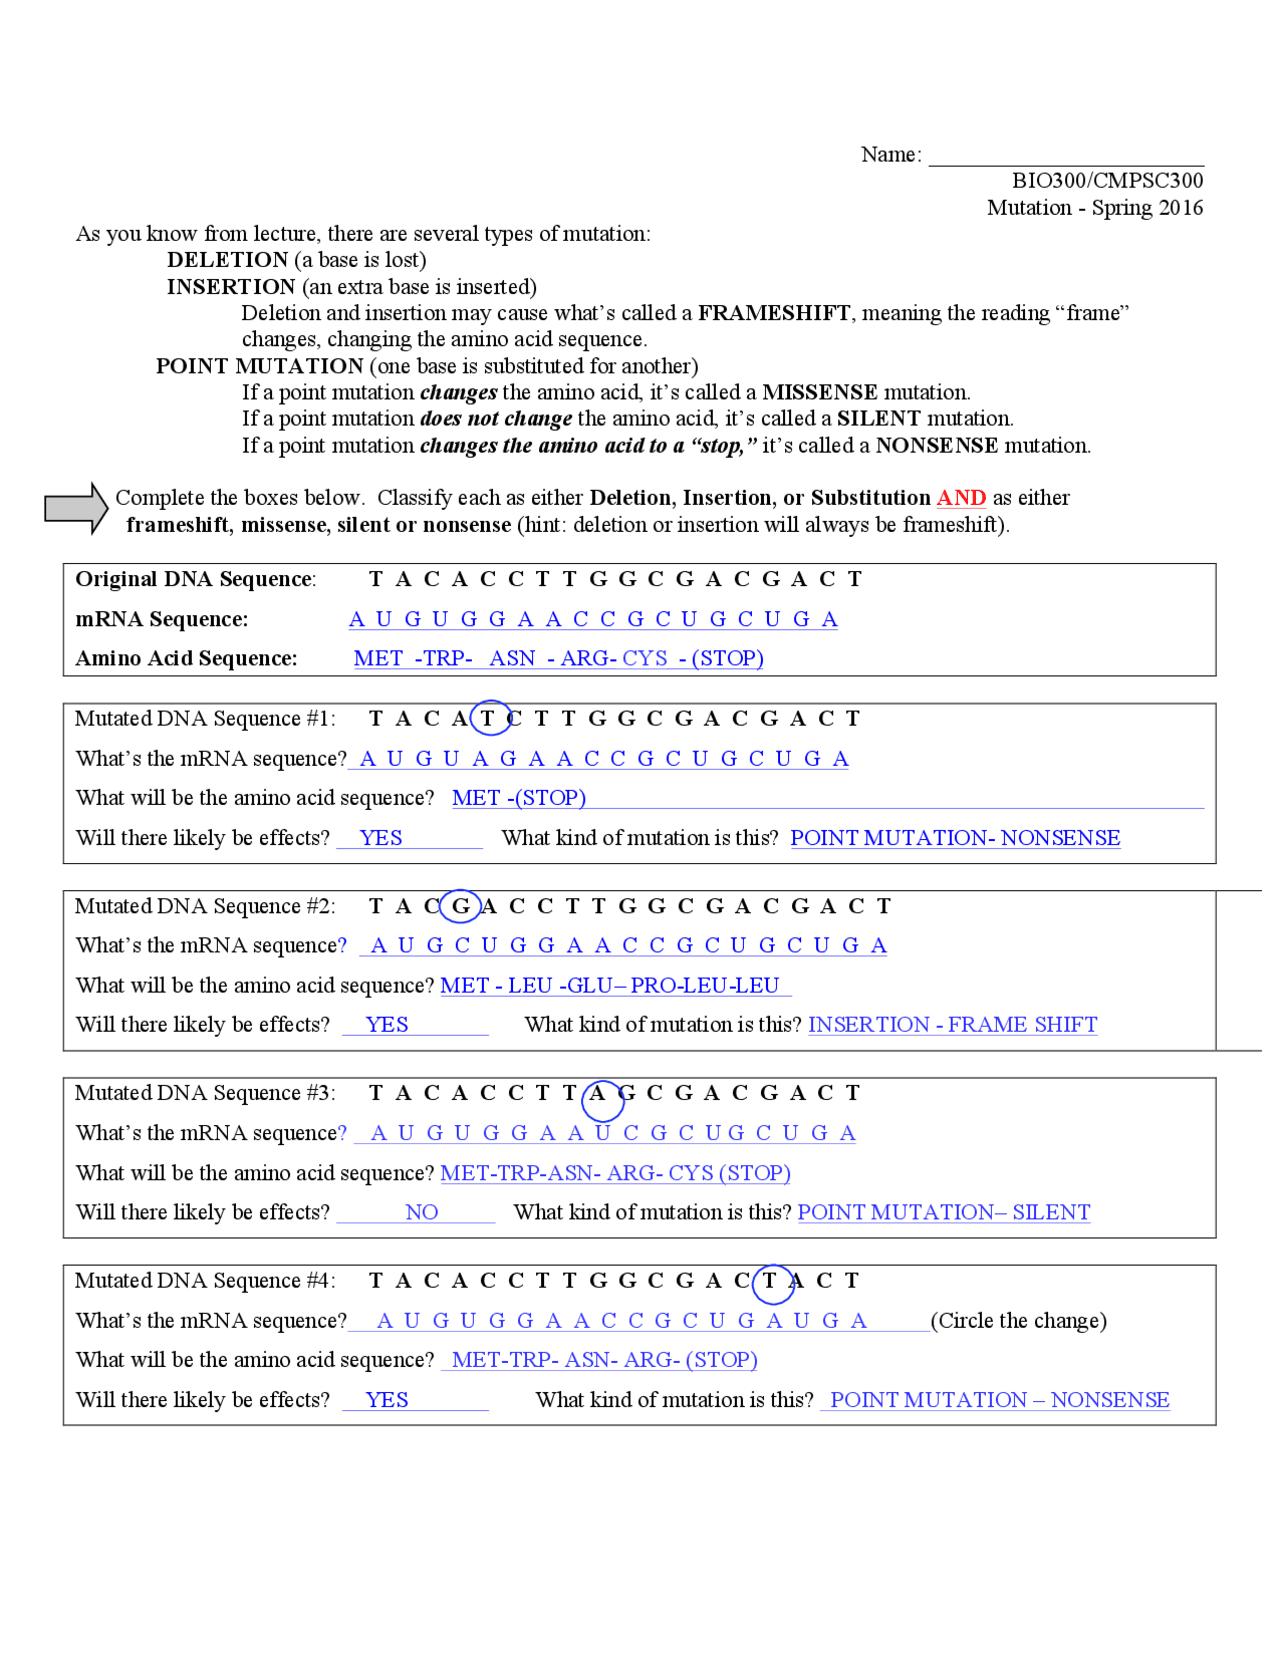 DNA Mutation Worksheet Key - Bioinformatics - Docsity With Dna Mutation Practice Worksheet Answers